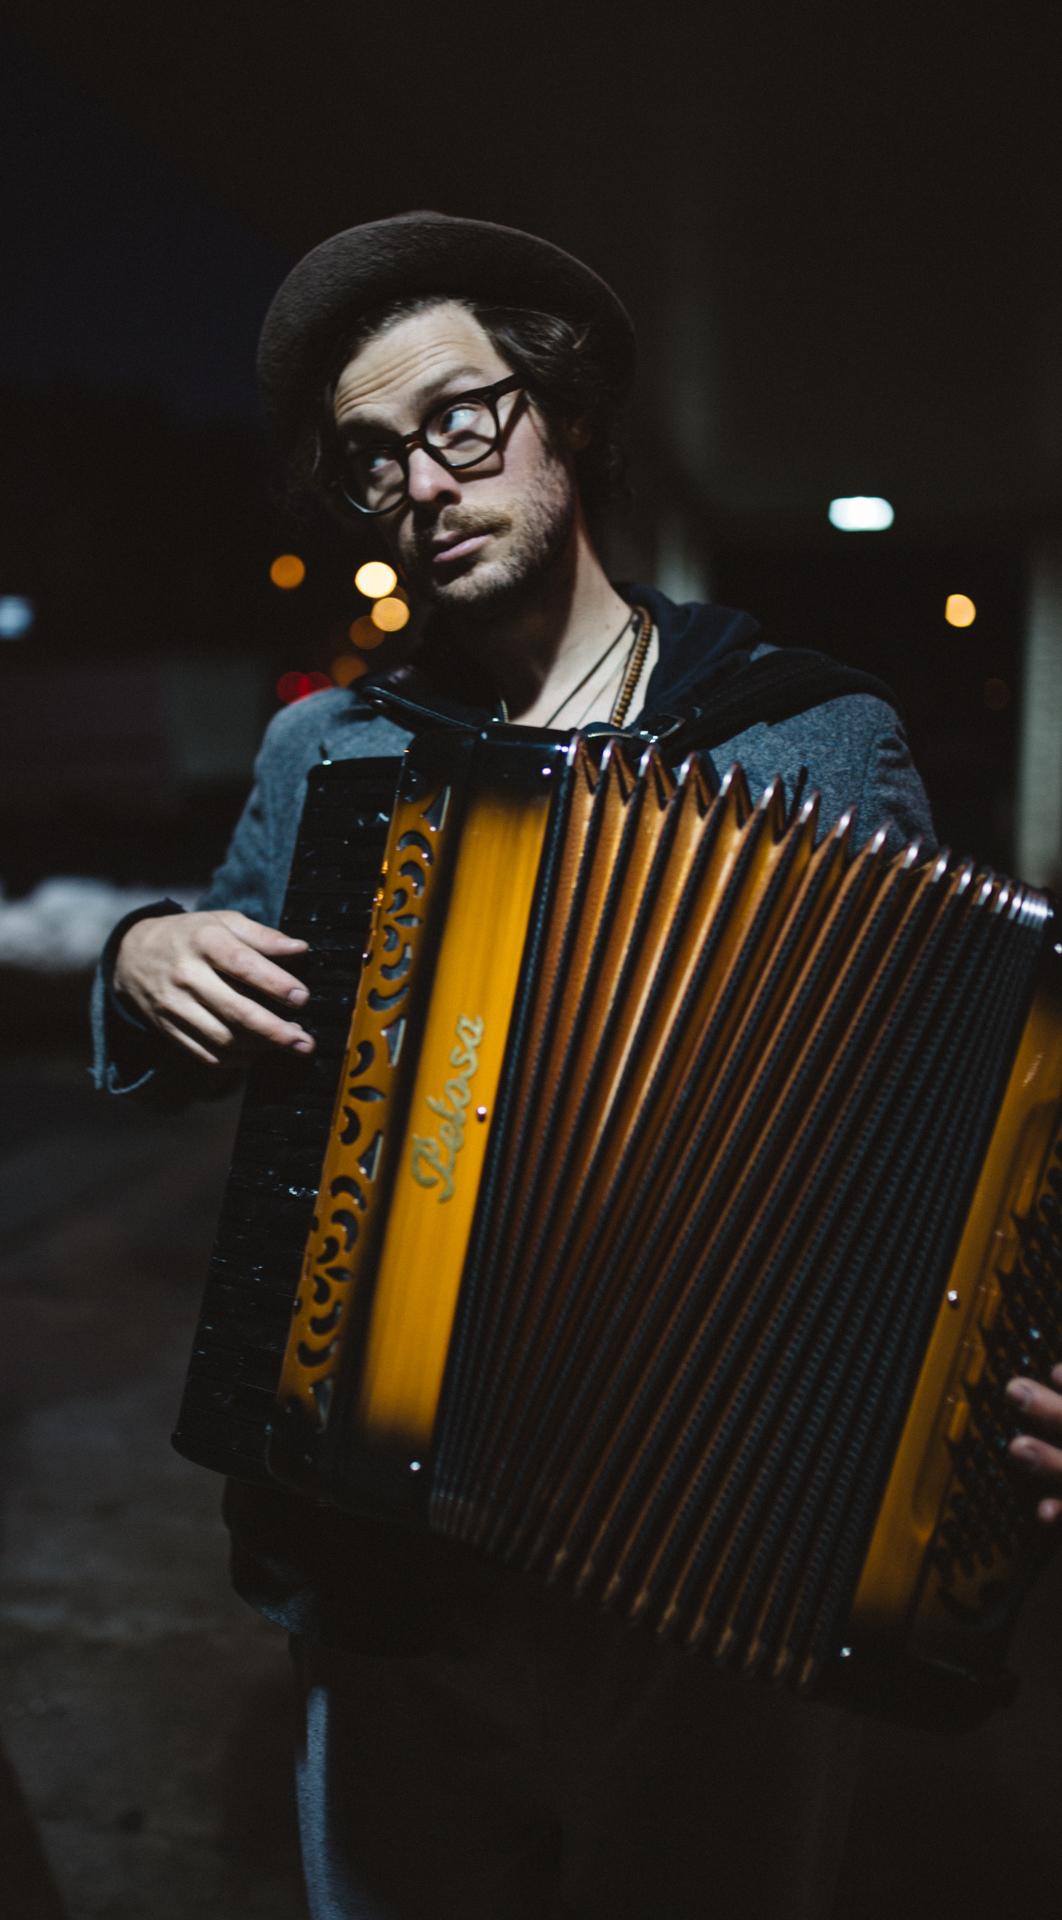 Stelth Ulvang of The Lumineers - Durham, NC Musician Portraits